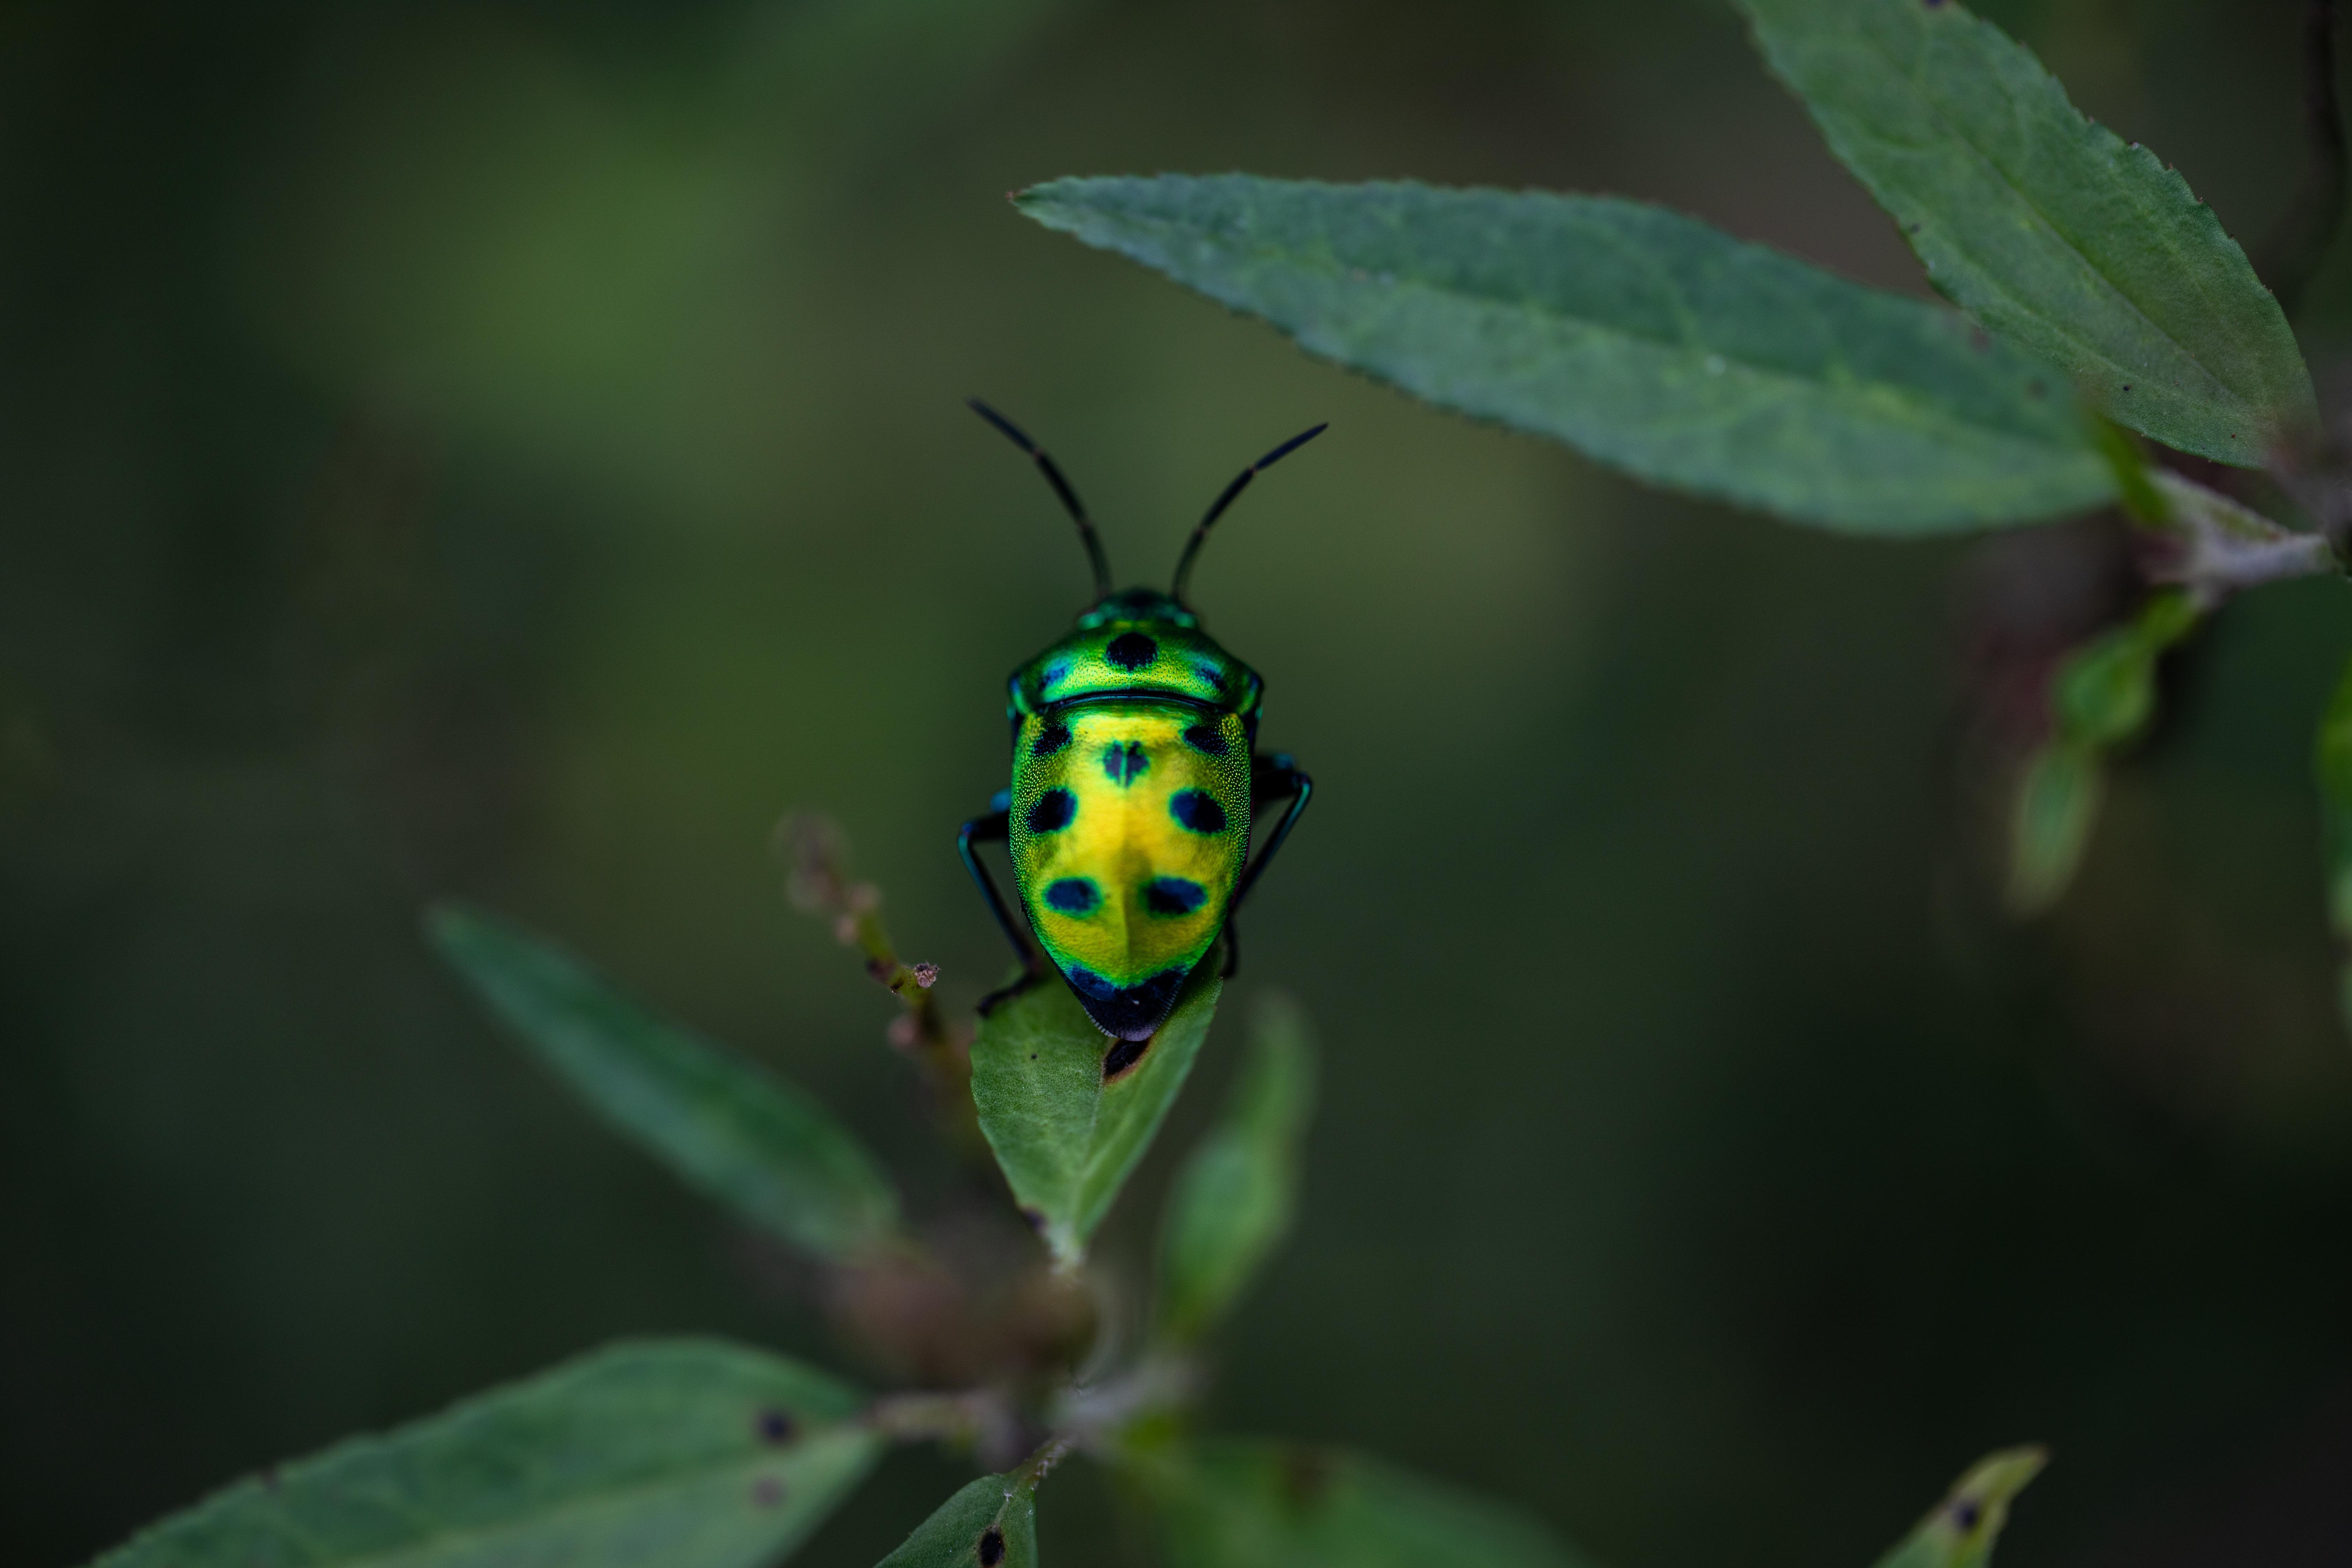 Biodiversity loss is not just an 'environmental' problem - Treasury